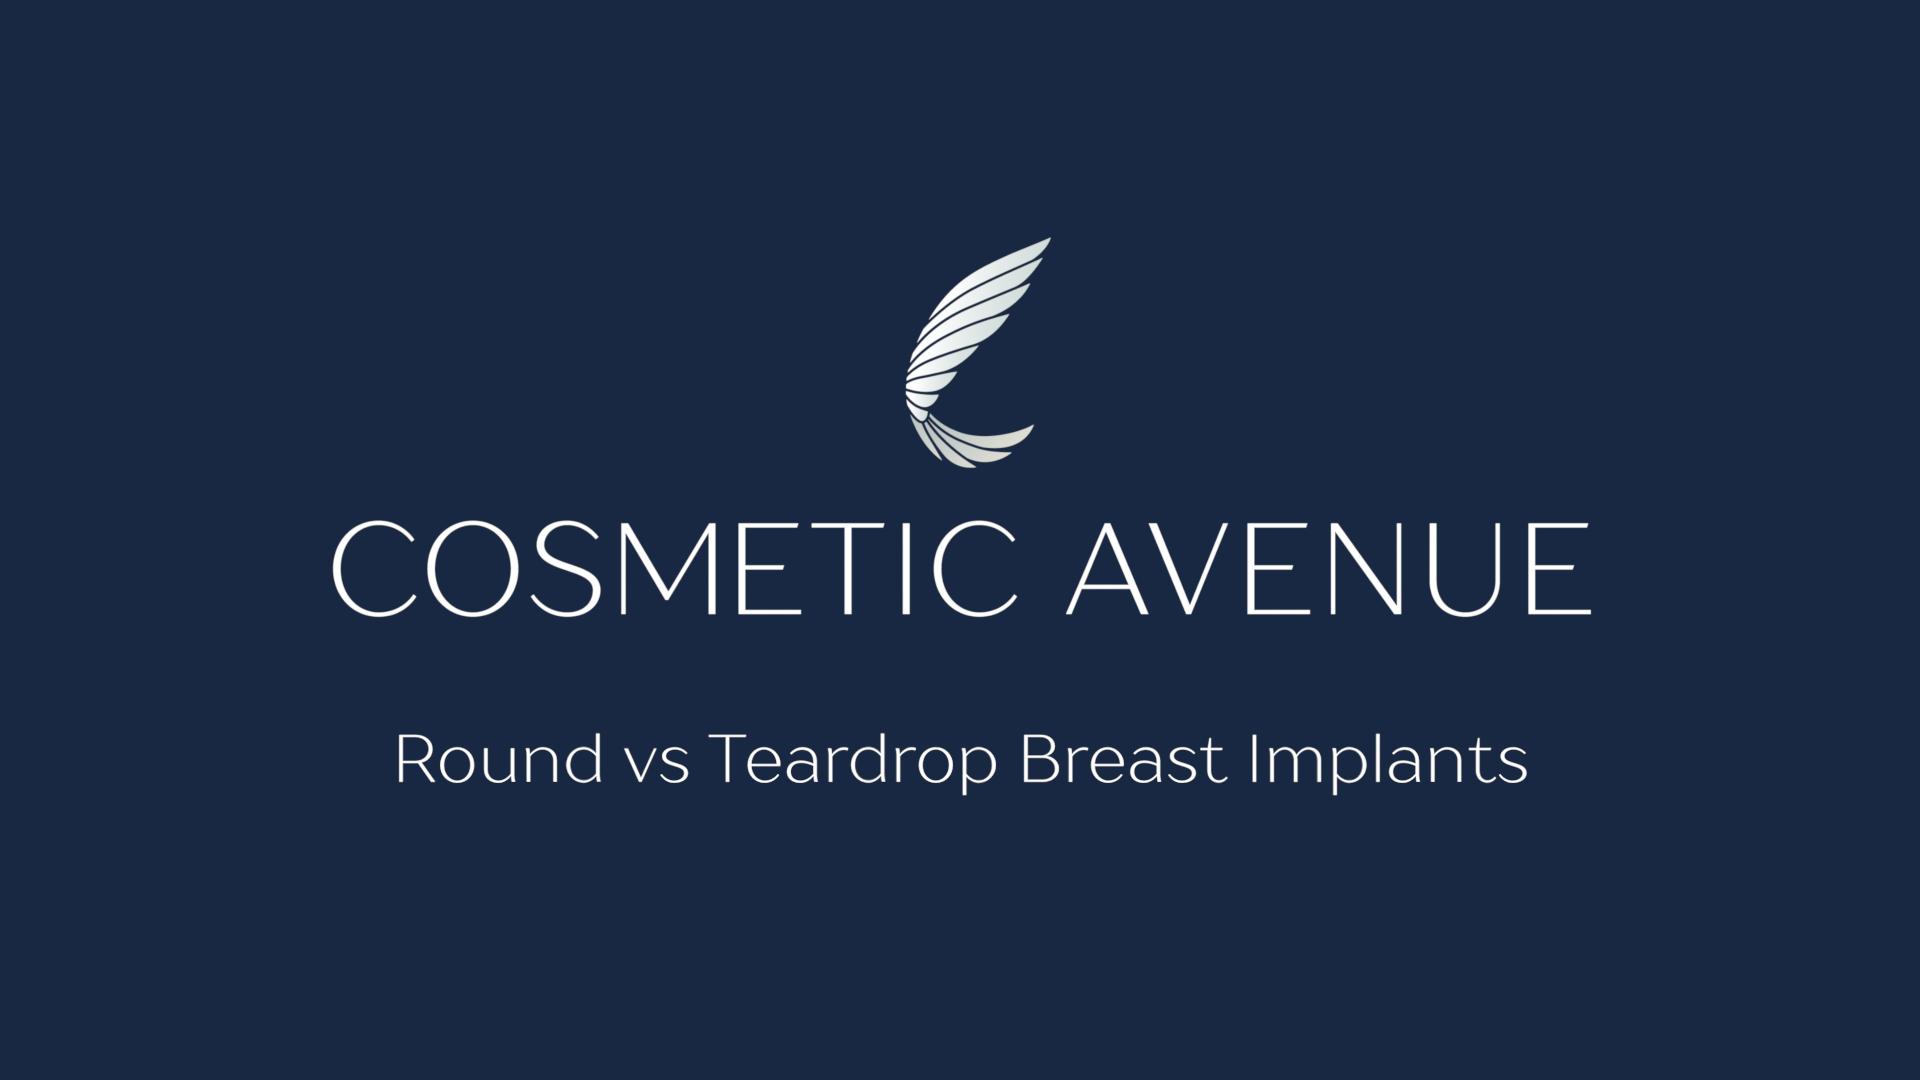 Round-vs-Teardrop-Breast-Implants